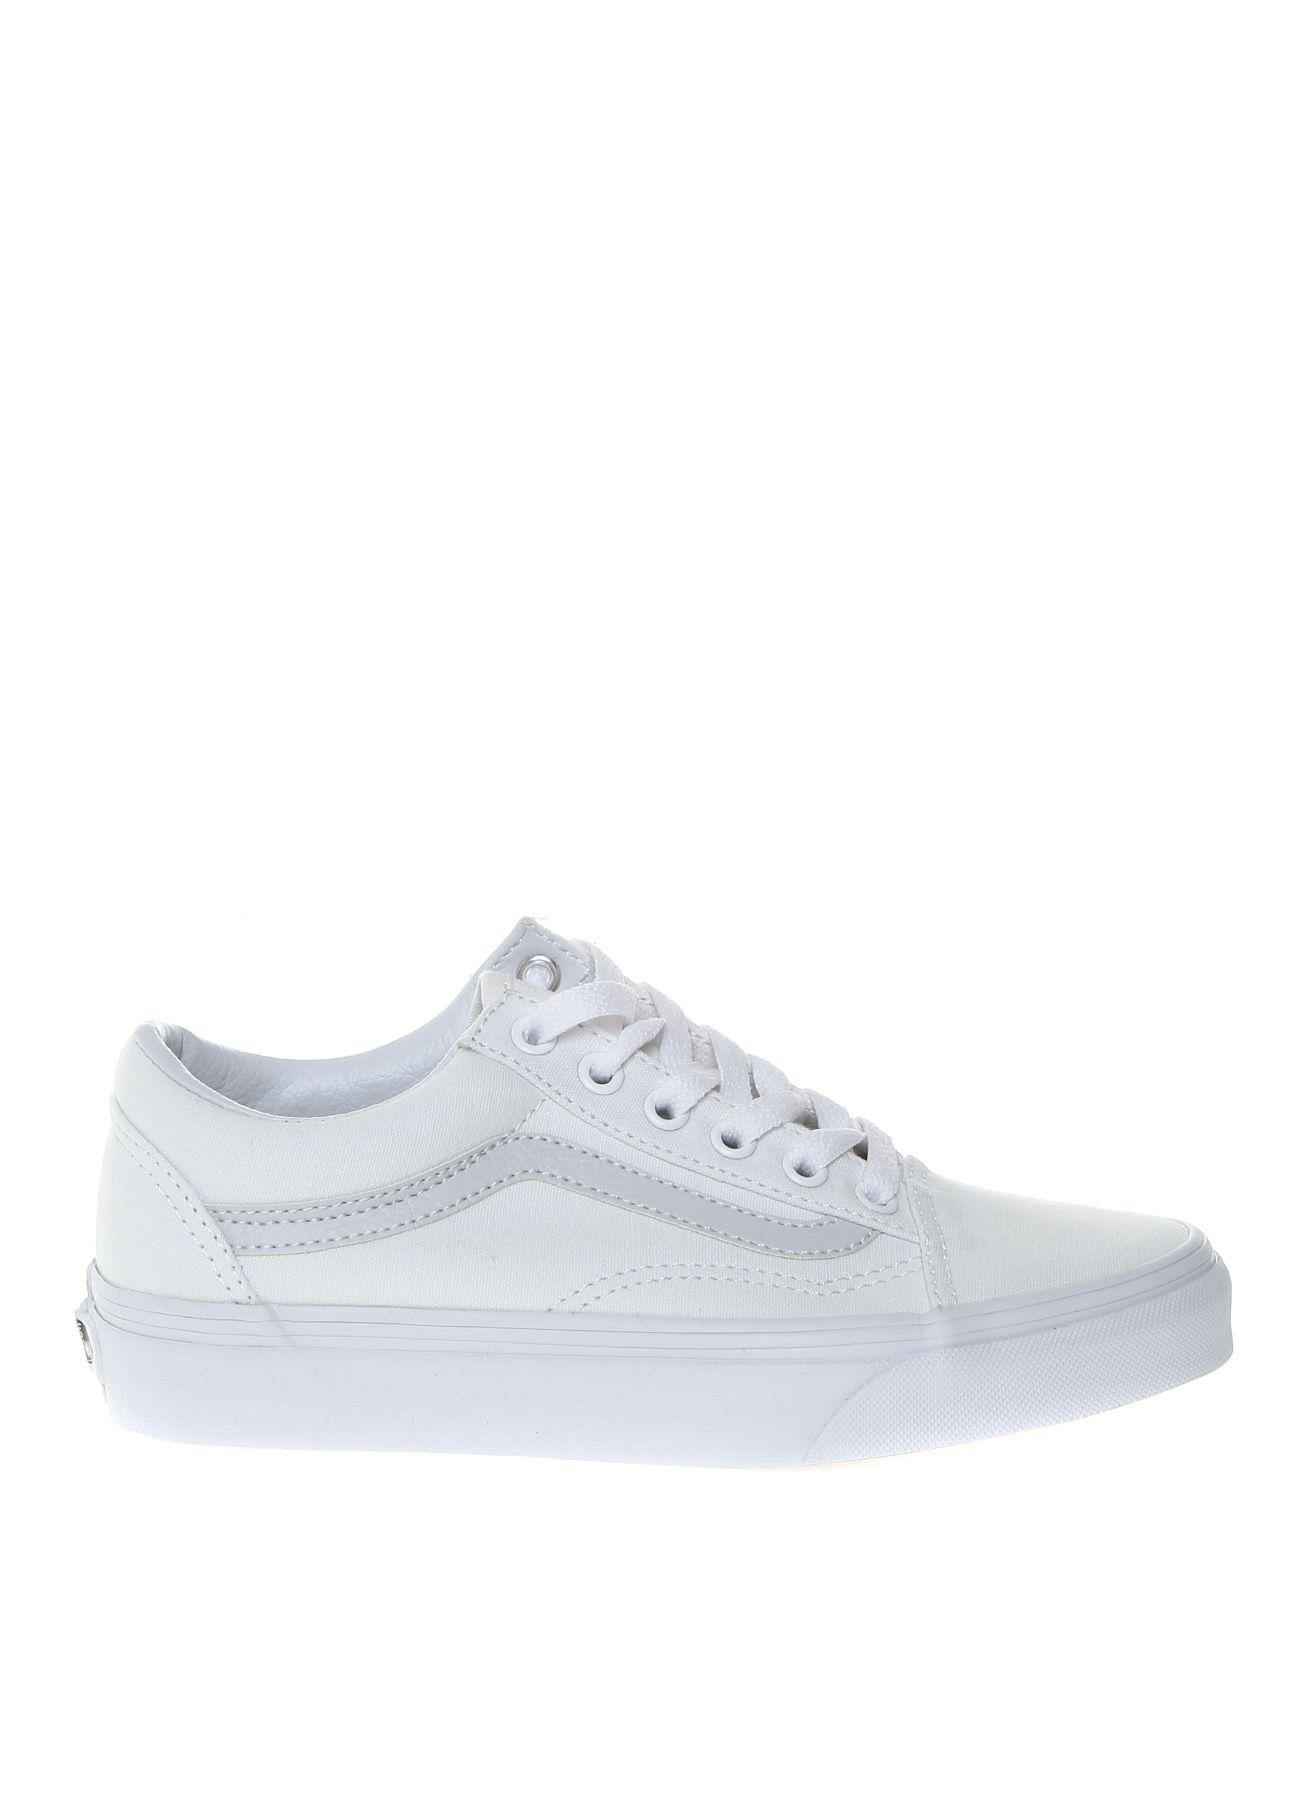 28a78a6f0f Vans - Vans Kadın Kanvas Beyaz Günlük Ayakkabı